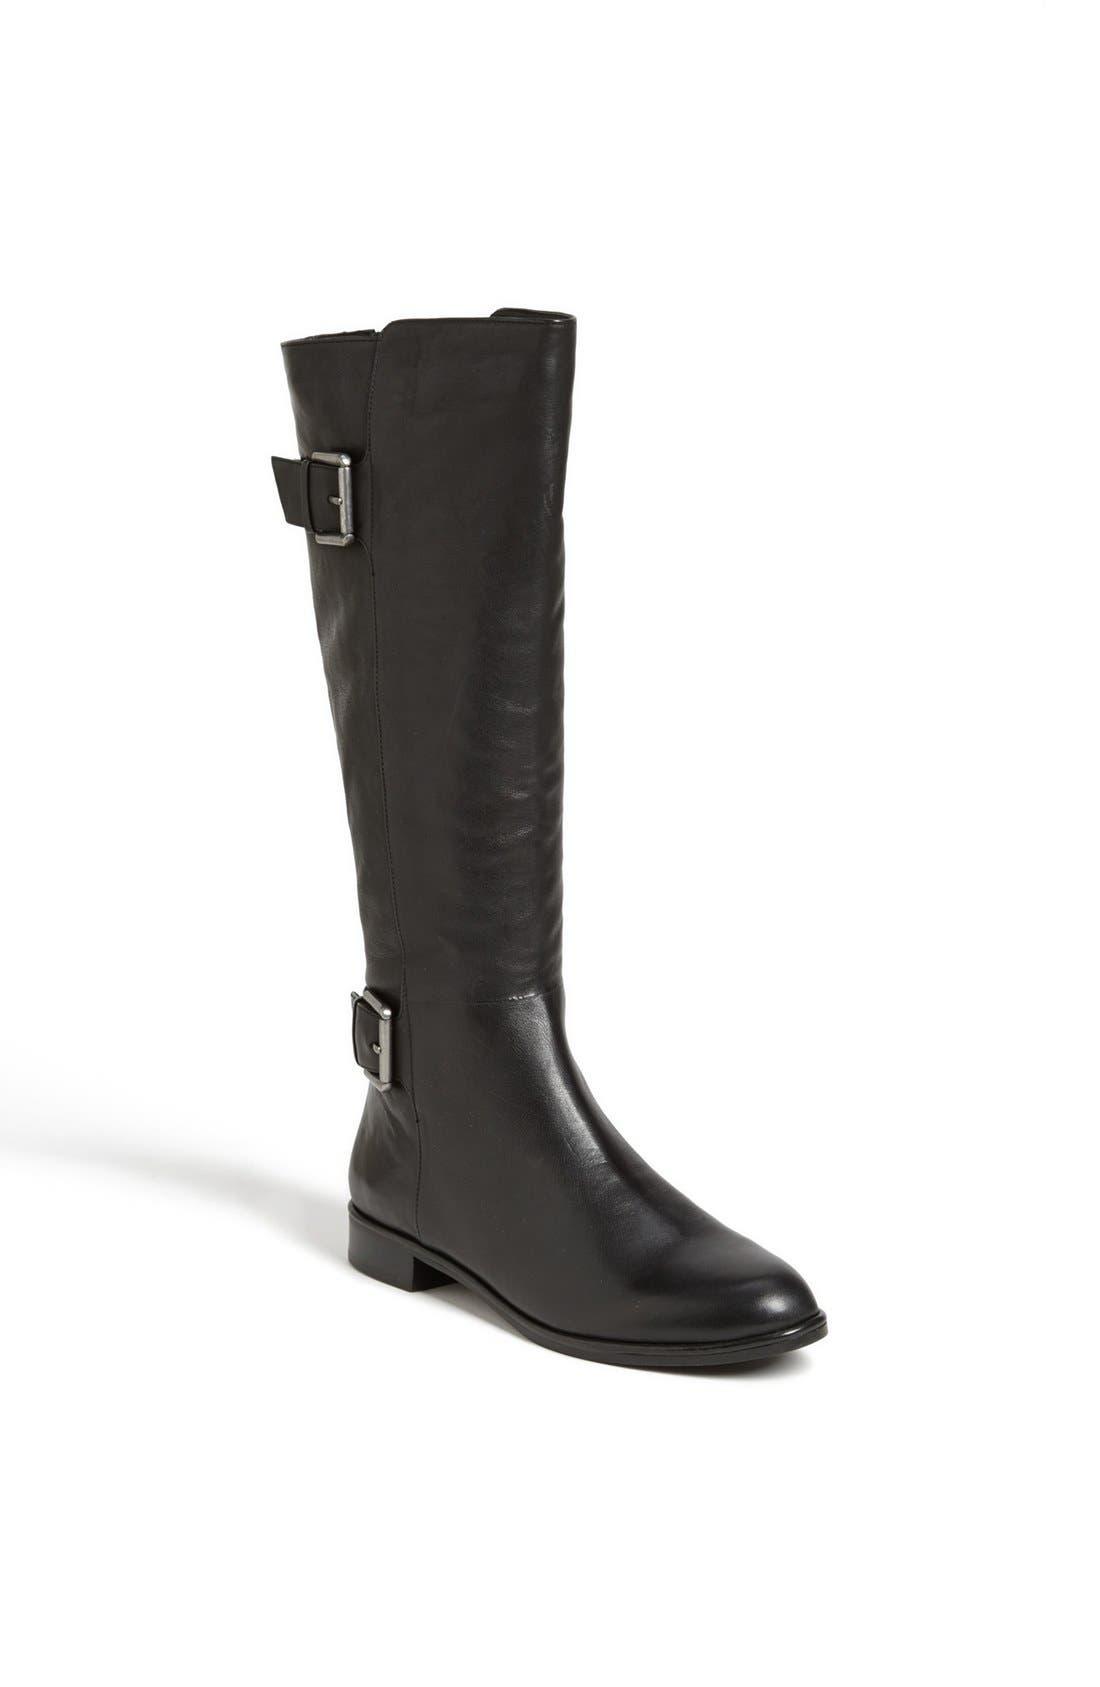 Main Image - Via Spiga 'Idelissa' Boot